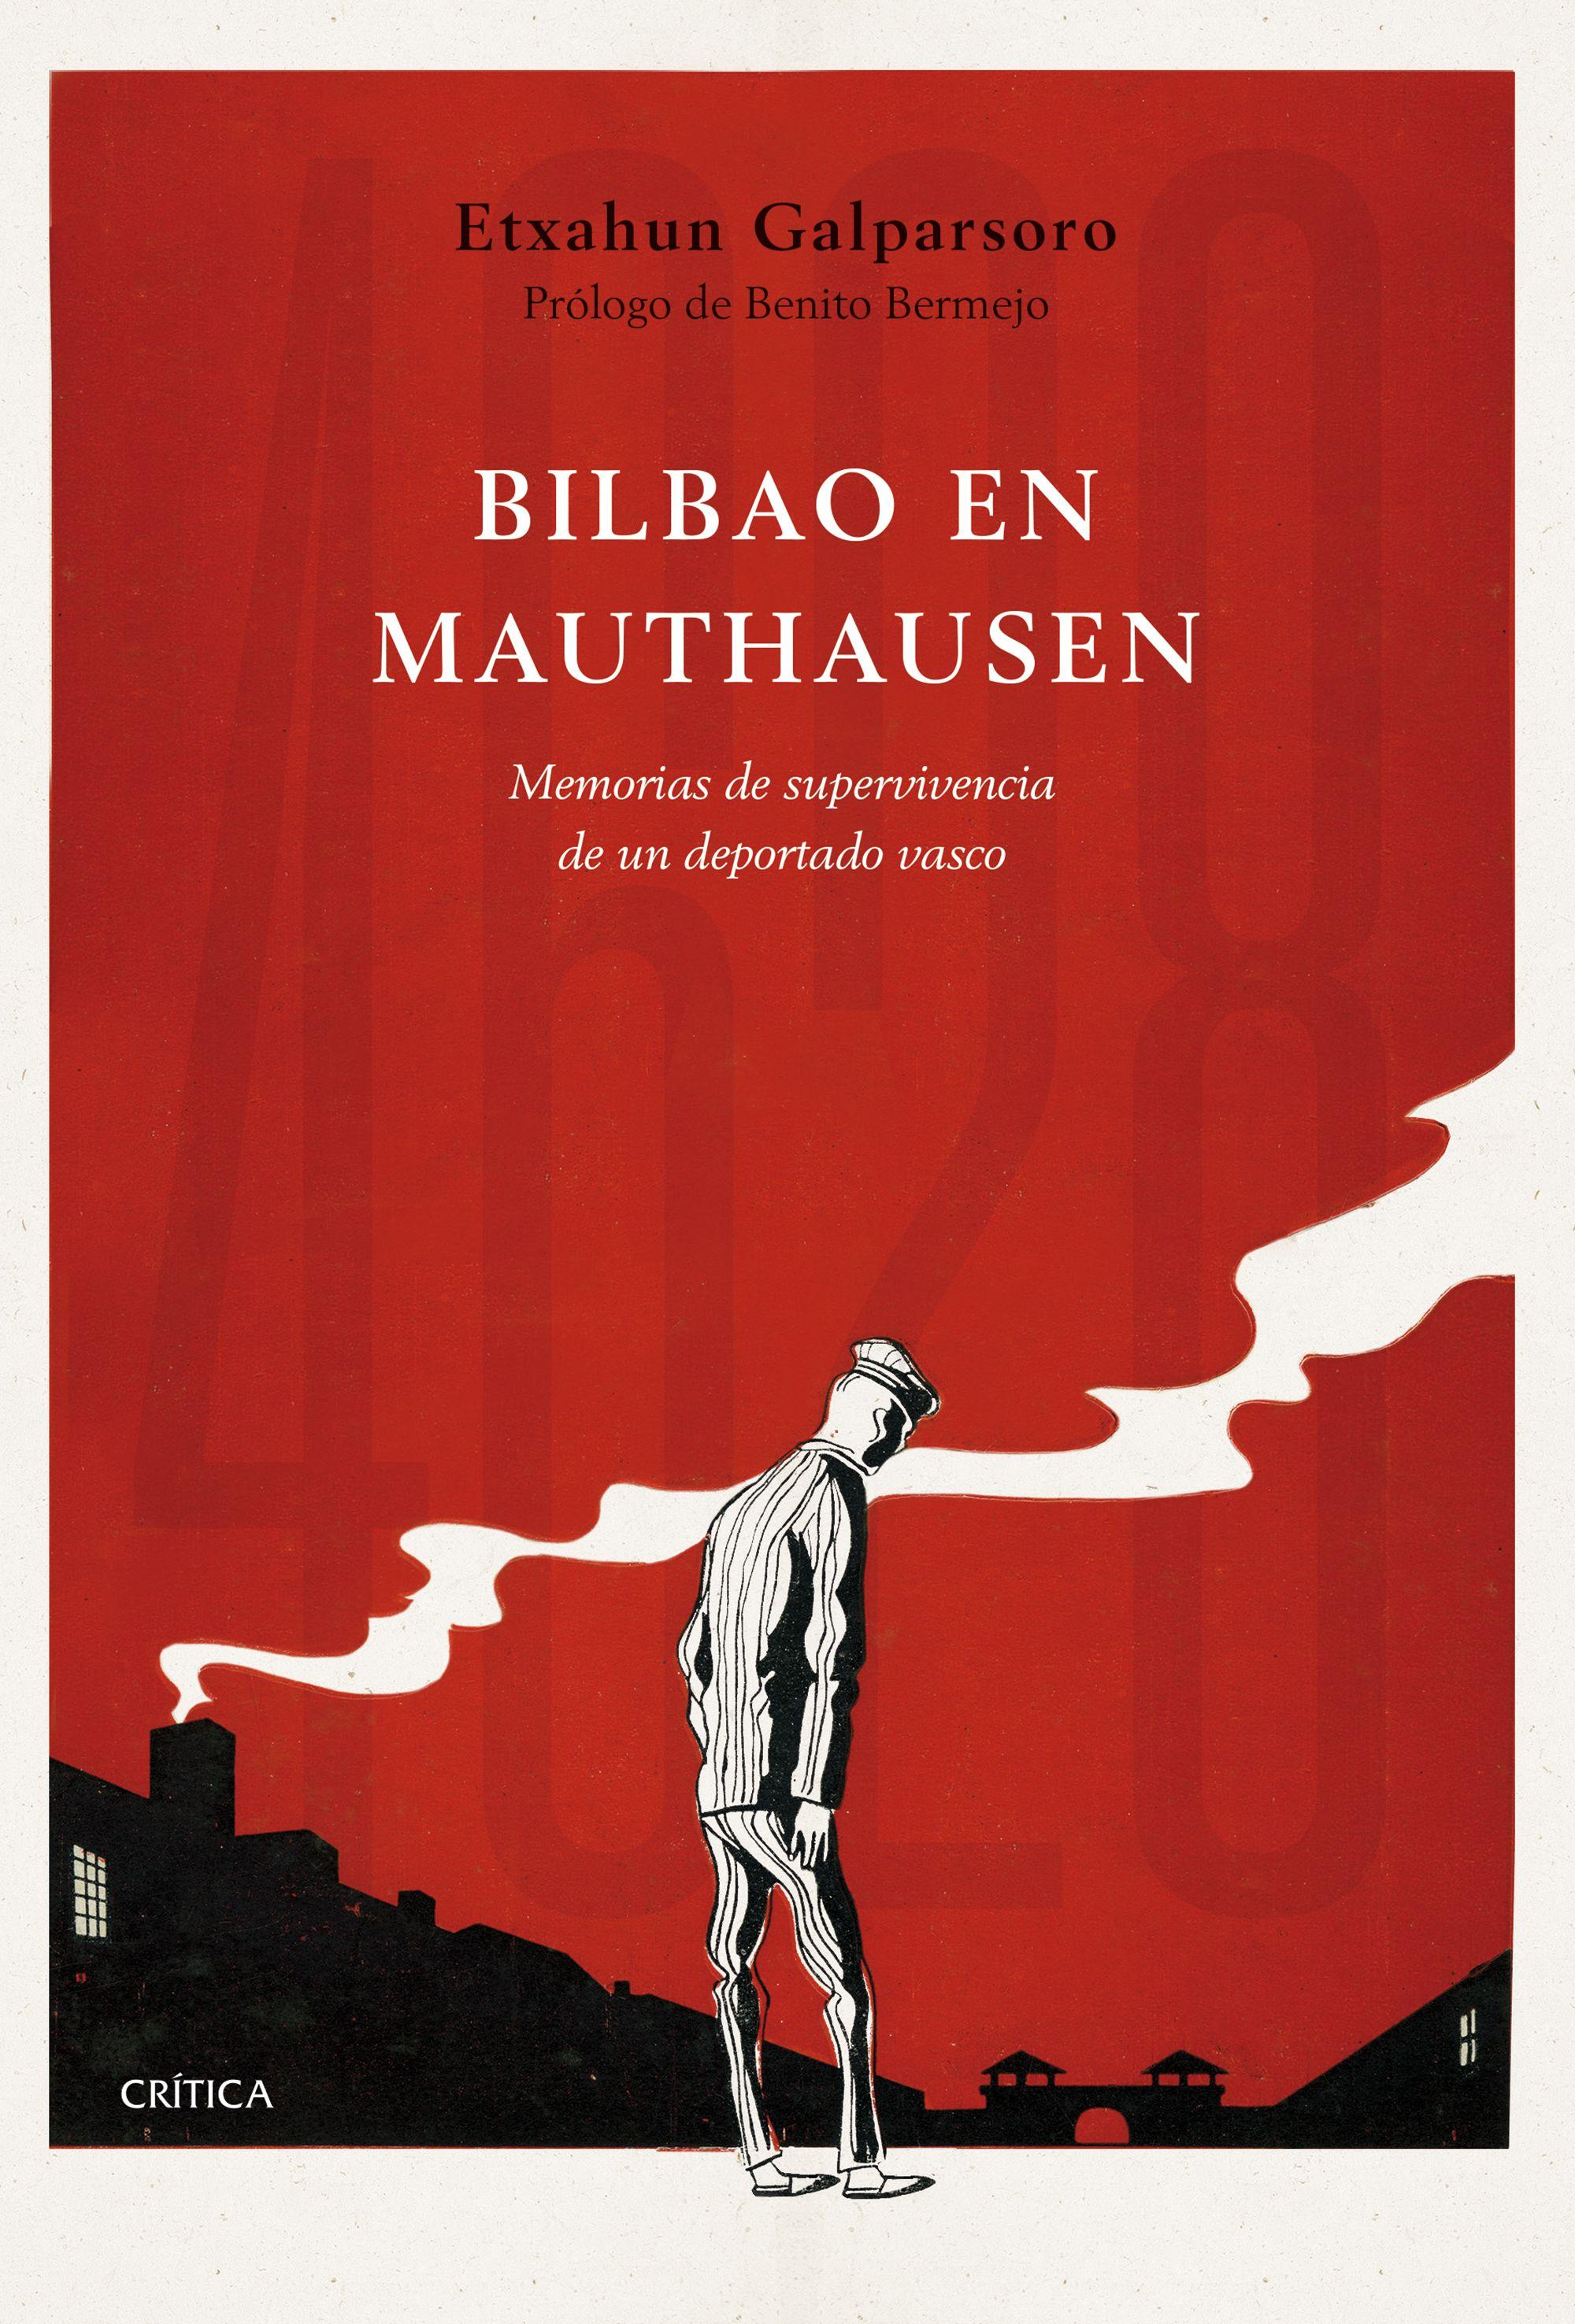 Bilbao en Mathausen